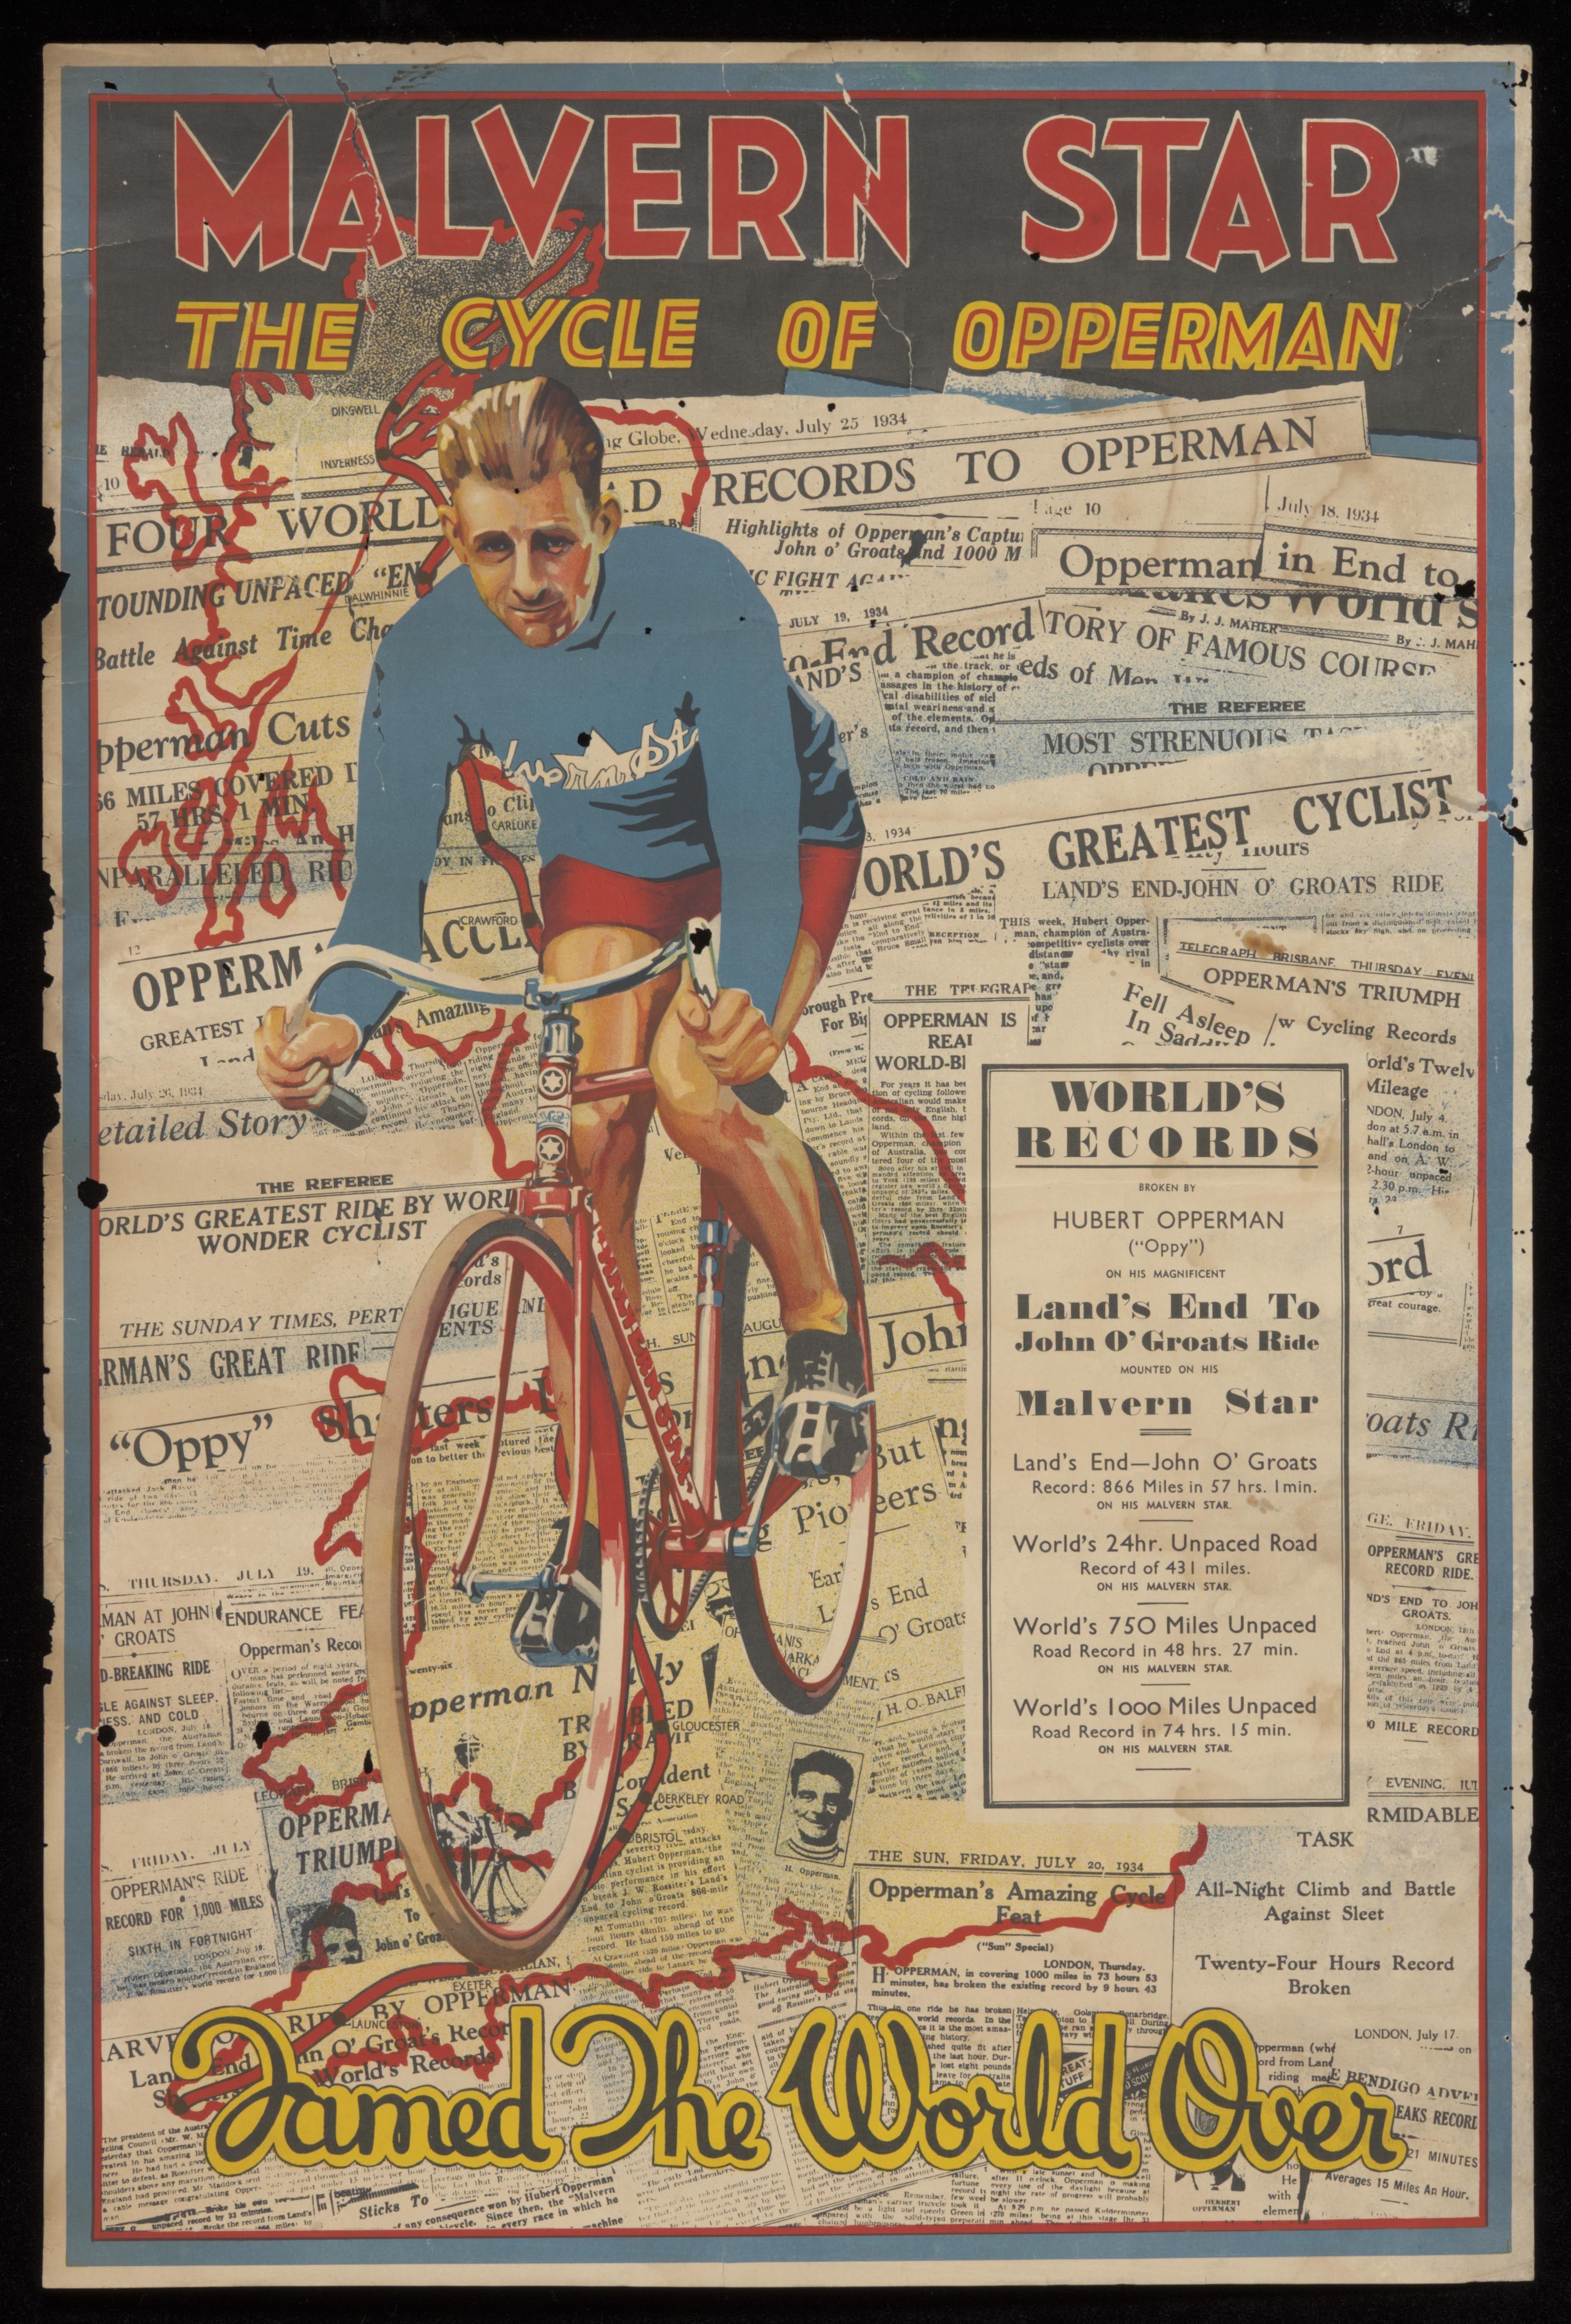 Malvern Star poster featuring Hubert Opperman, 1935 National Museum ...